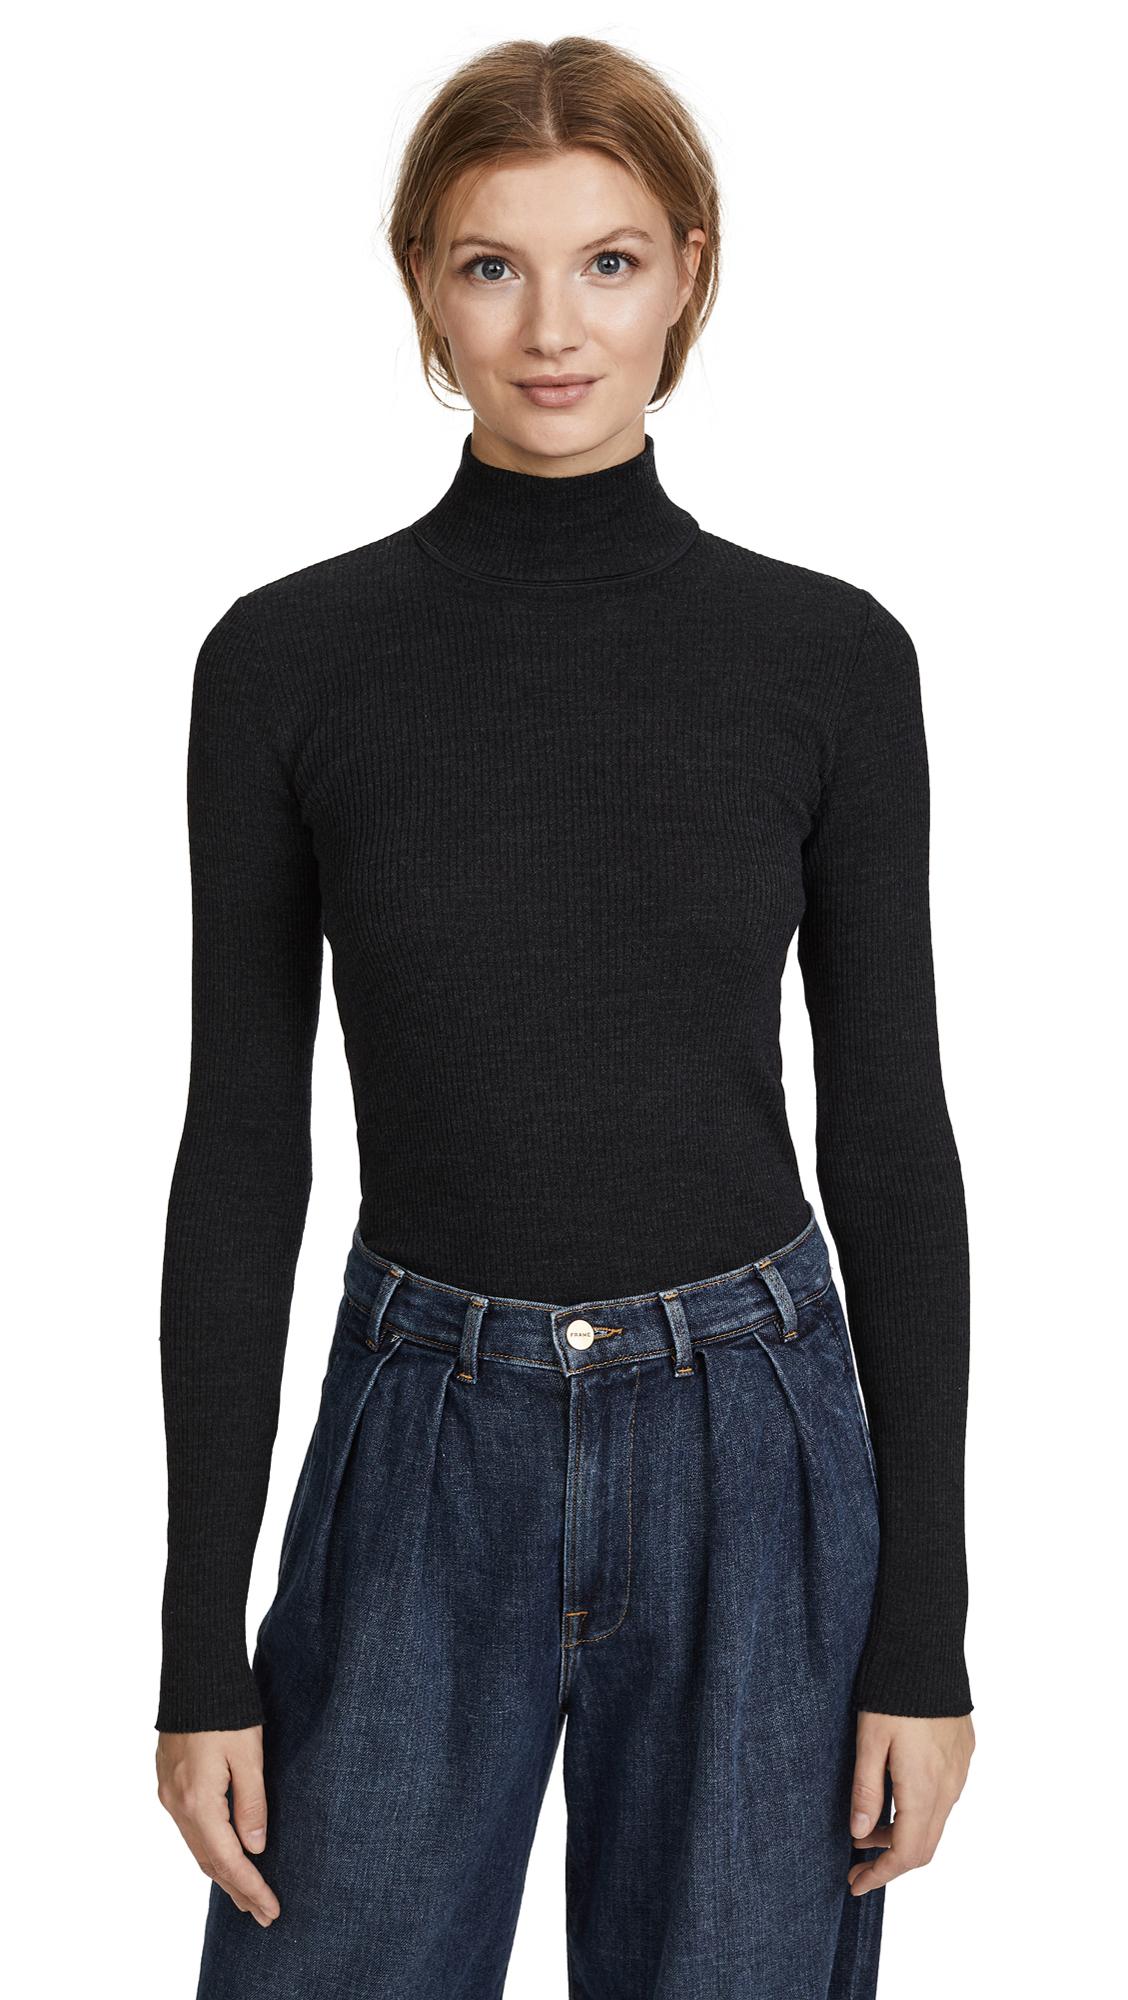 Theory Basic Sweater - Charcoal